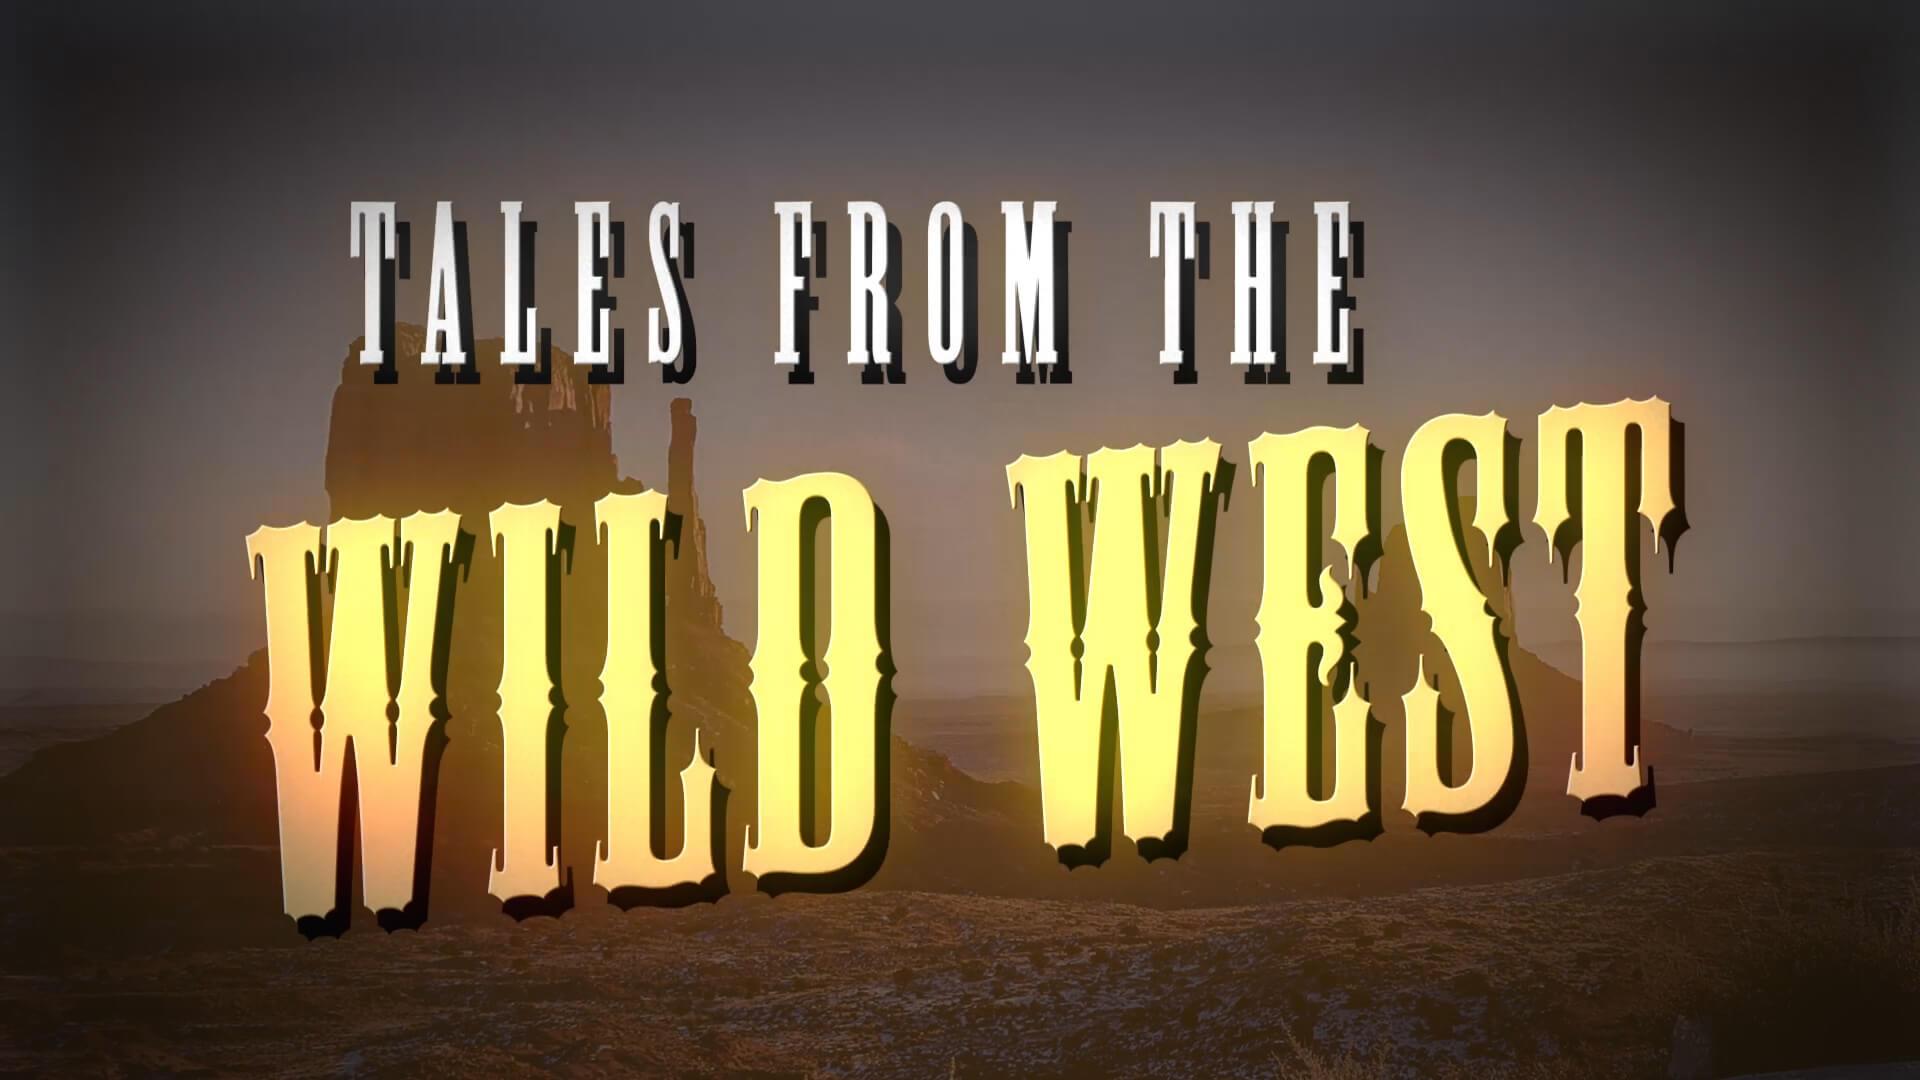 Vintage Classic Wild West Movie Title